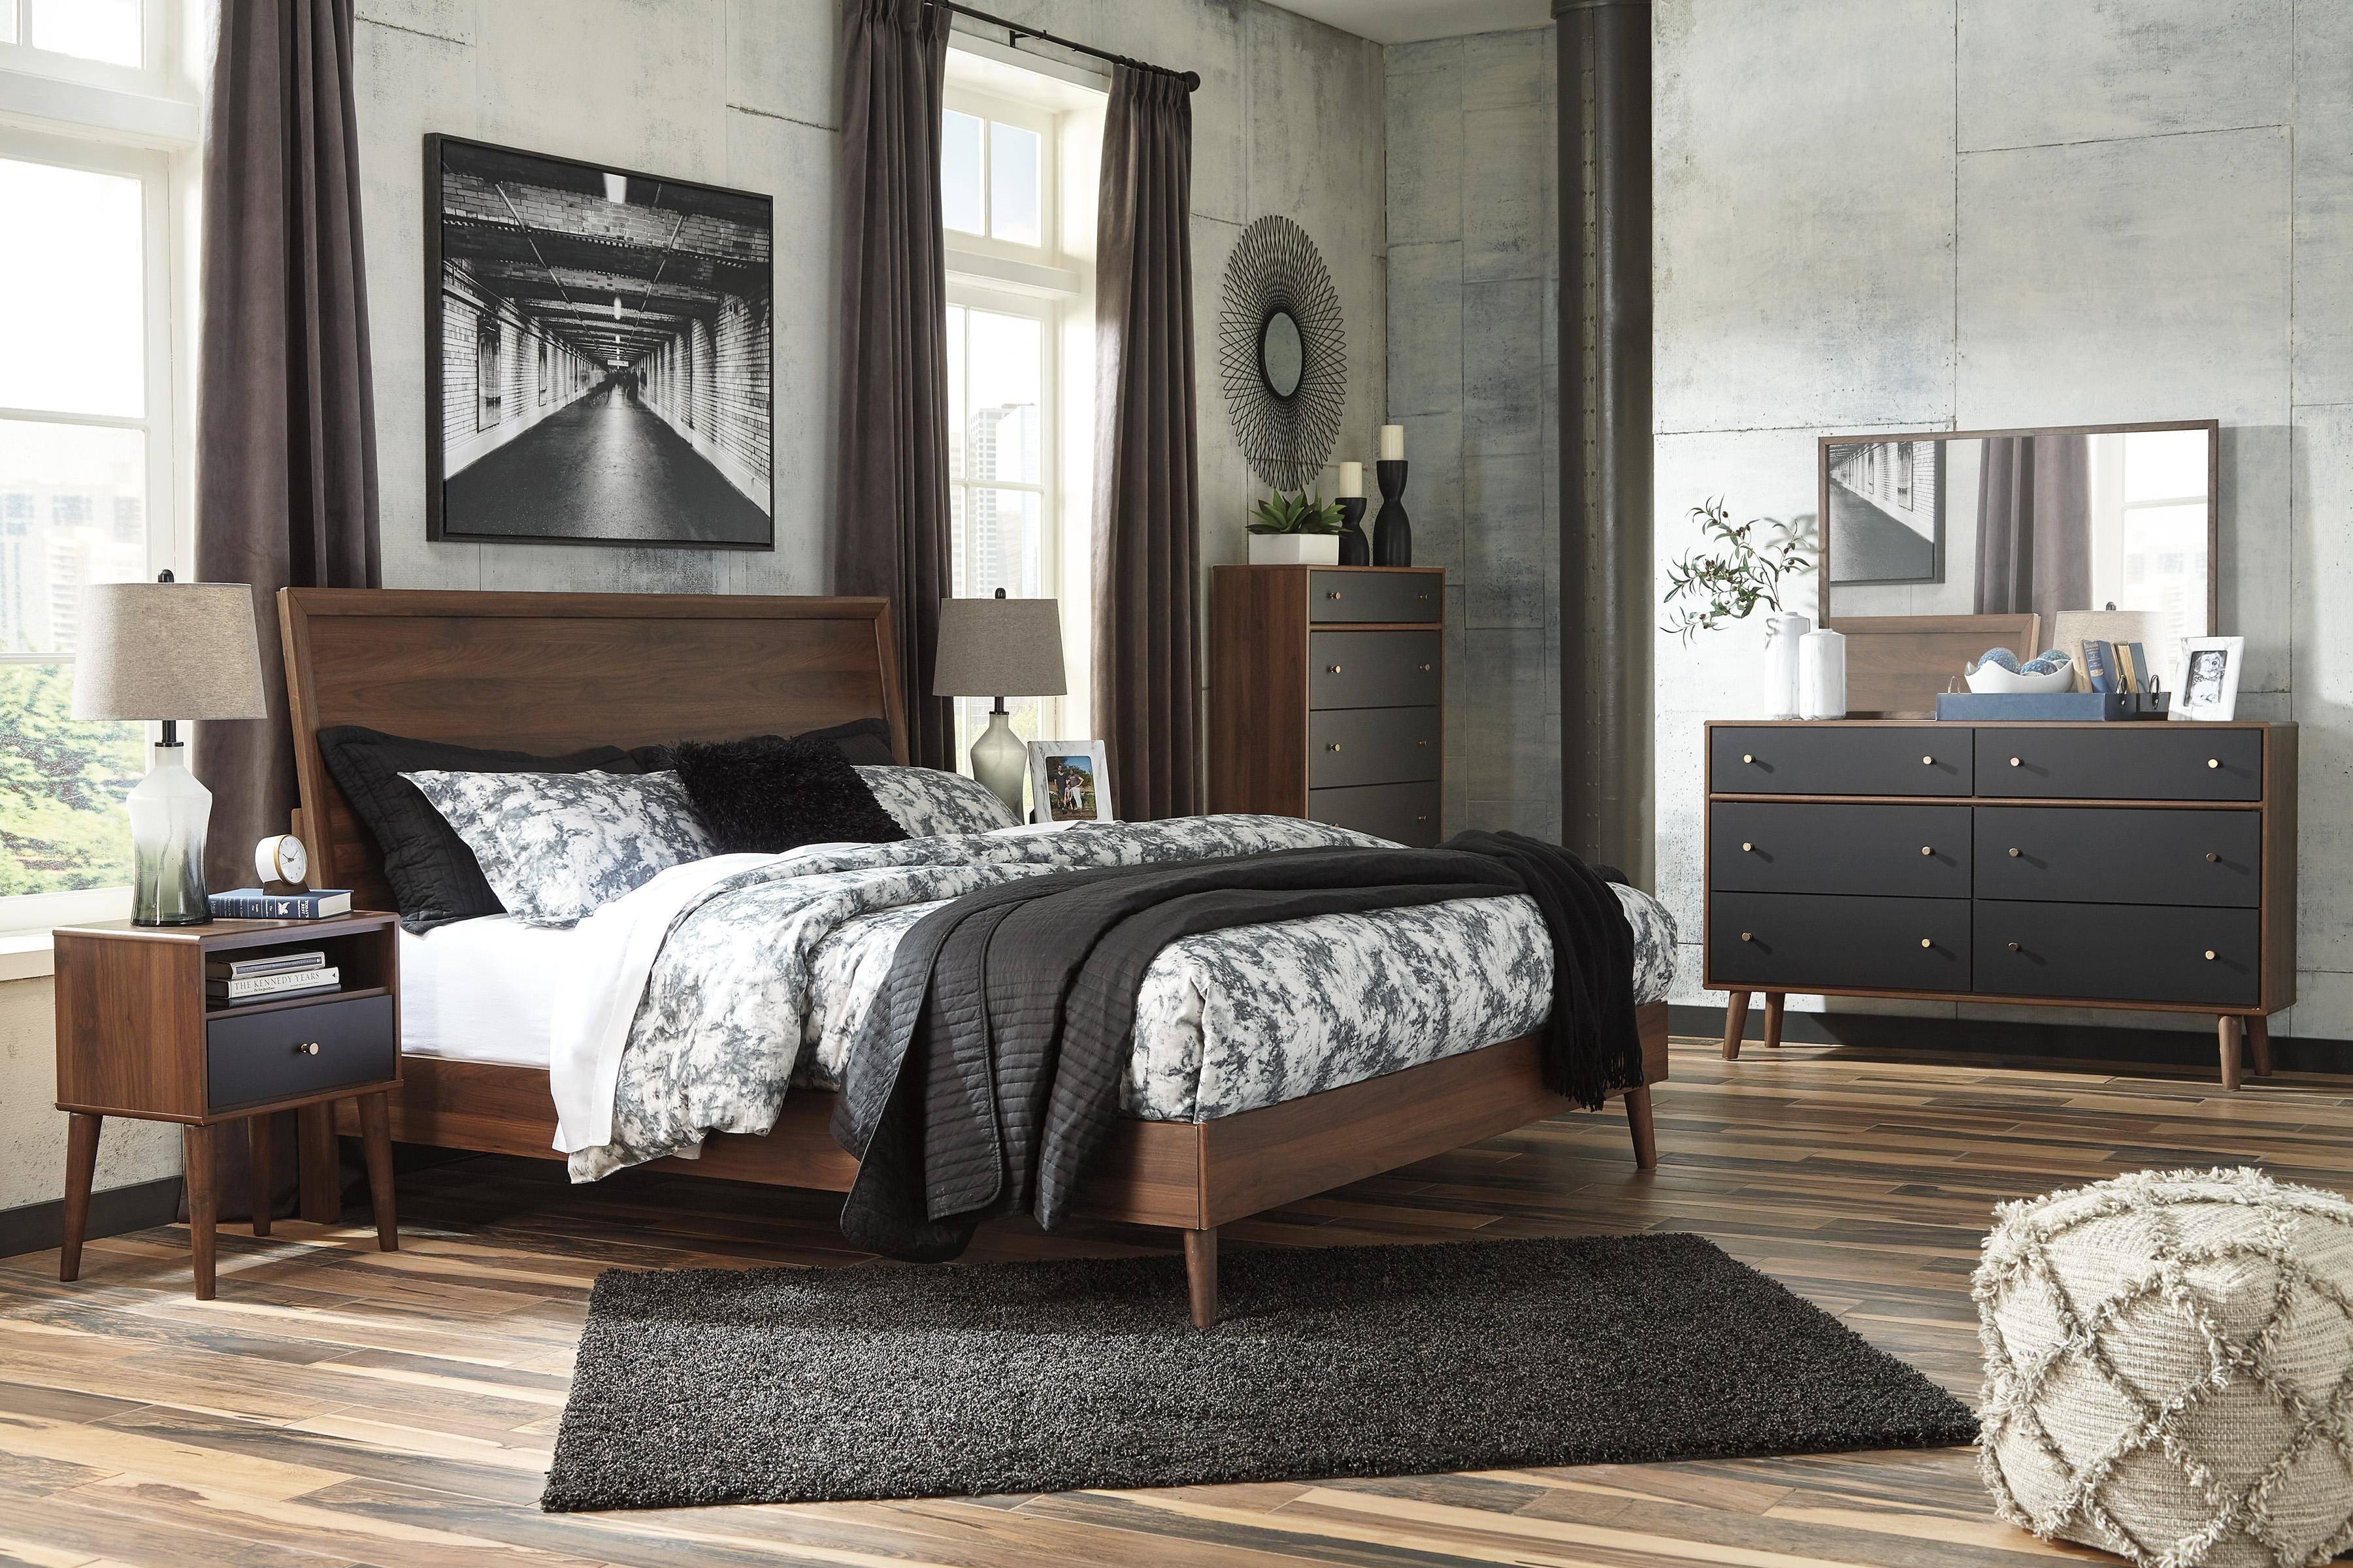 Ashley Home Store Bedroom Set New ashley Daneston B292 King Size Panel Bedroom Set 6pcs In